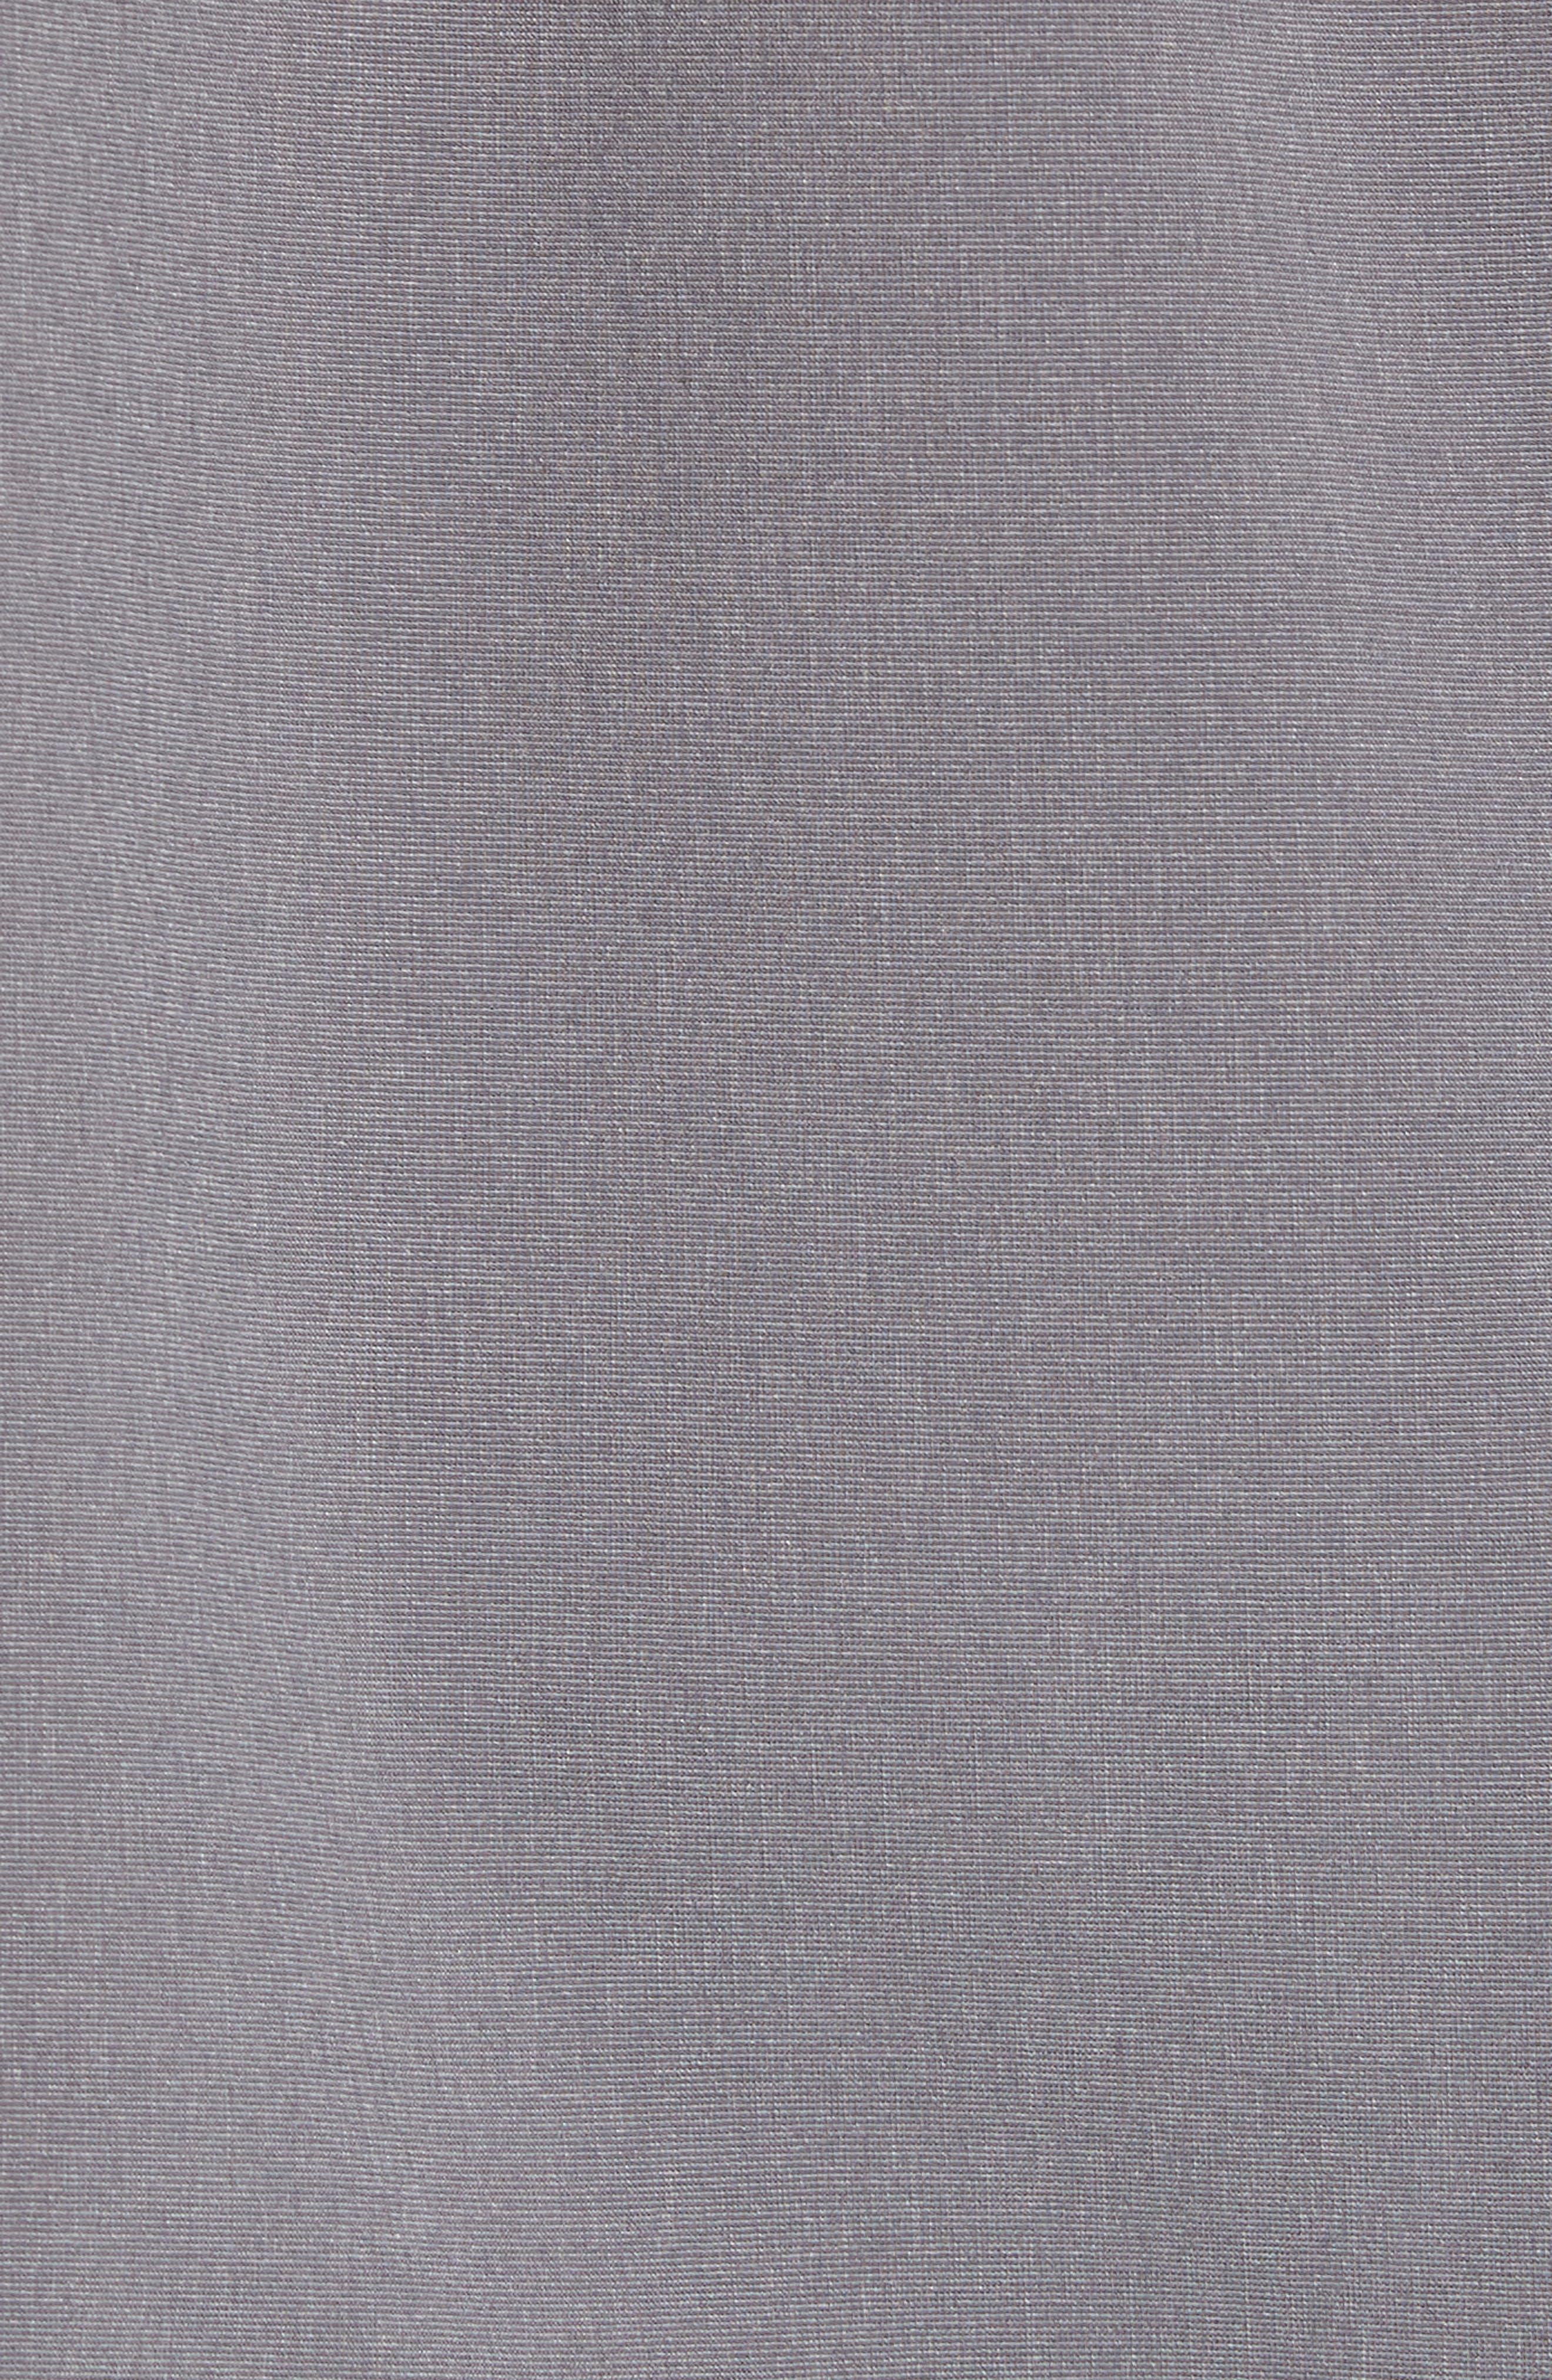 Apex Flex Gore-Tex<sup>®</sup> Waterproof Jacket,                             Alternate thumbnail 5, color,                             Medium Grey Heather